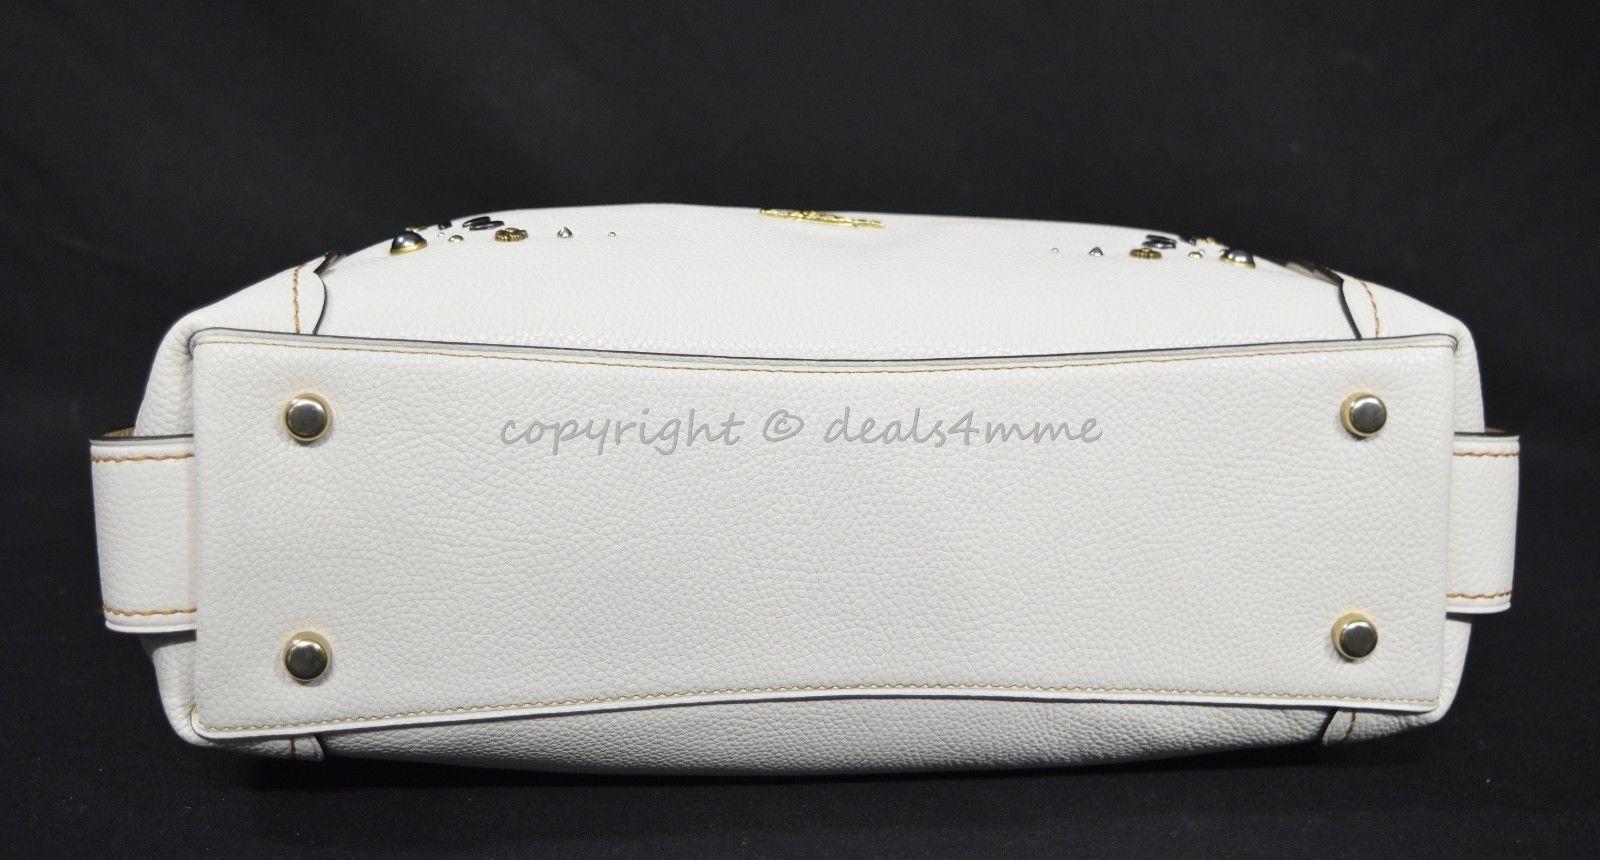 NWT Coach 29336 Edie 31 Leather Shoulder Bag and 41 similar items 22ada2dcab12a